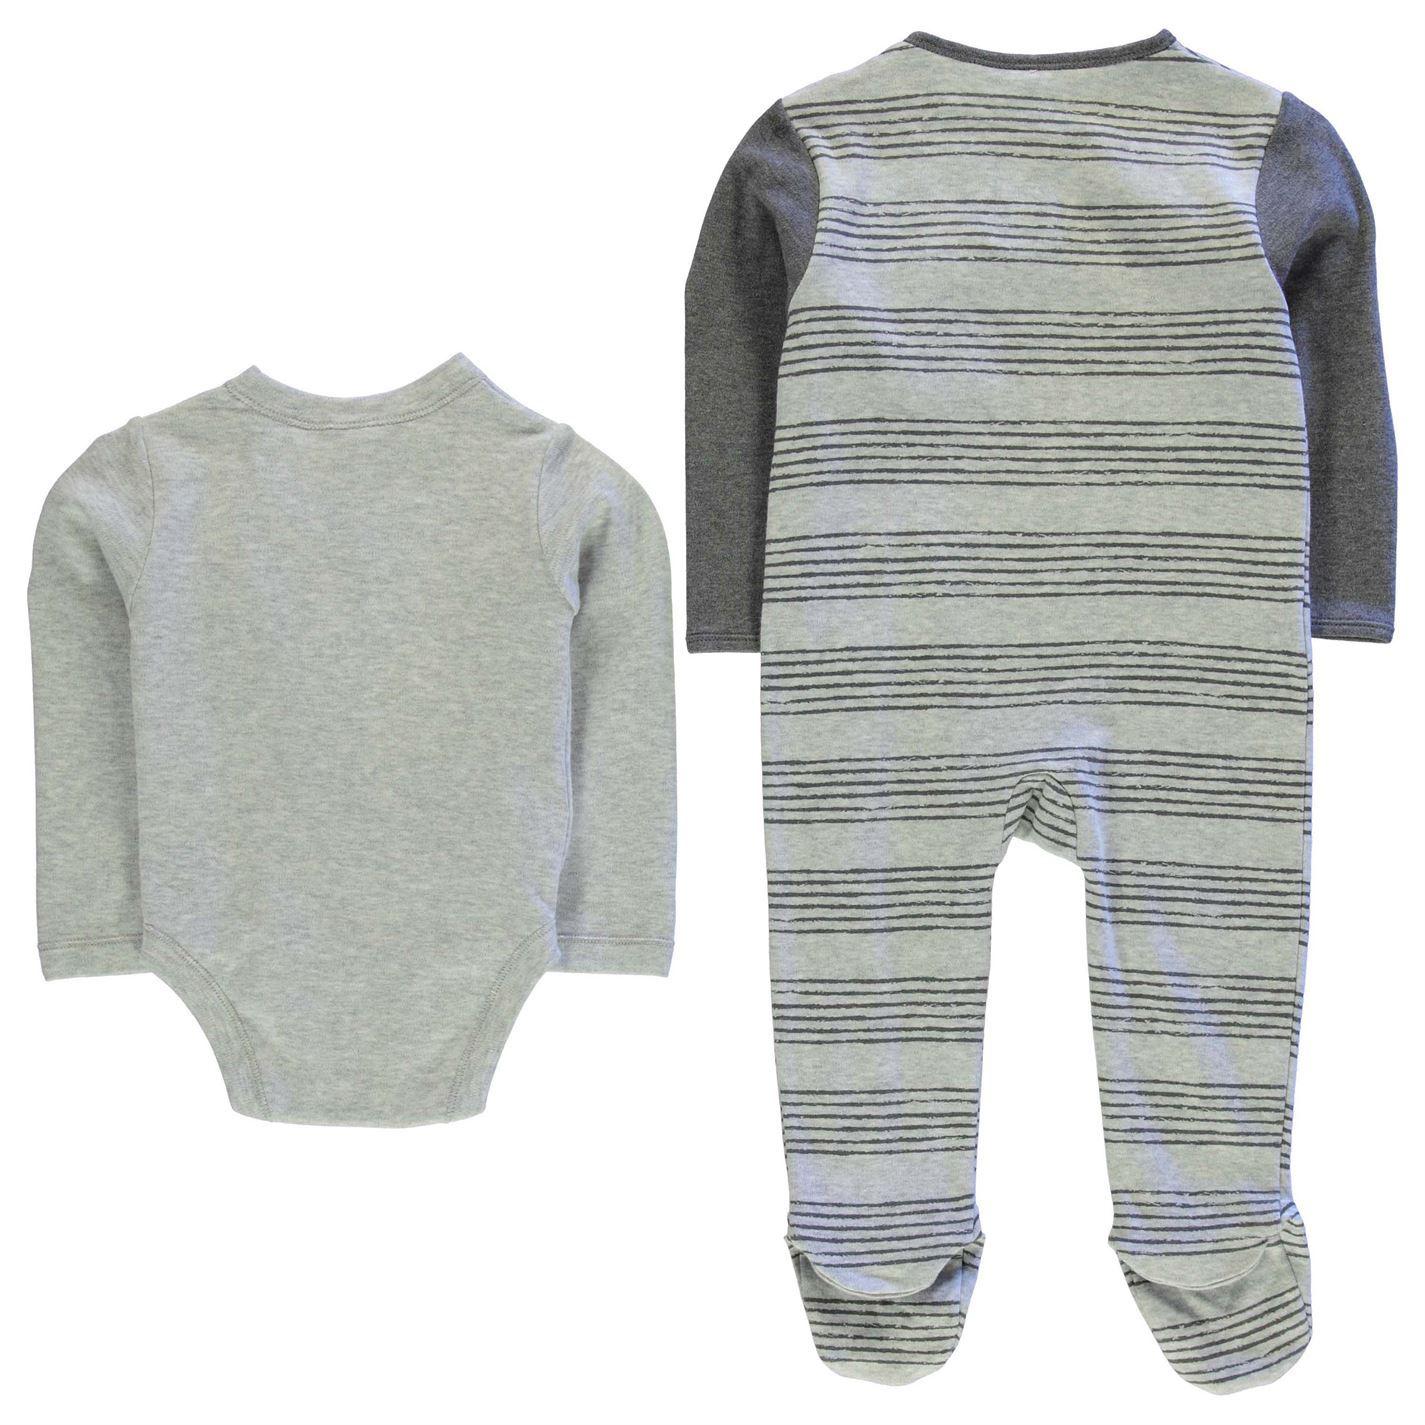 Tigger 4 Piece Romper Suit Set Infant Baby Grey Clothes Set